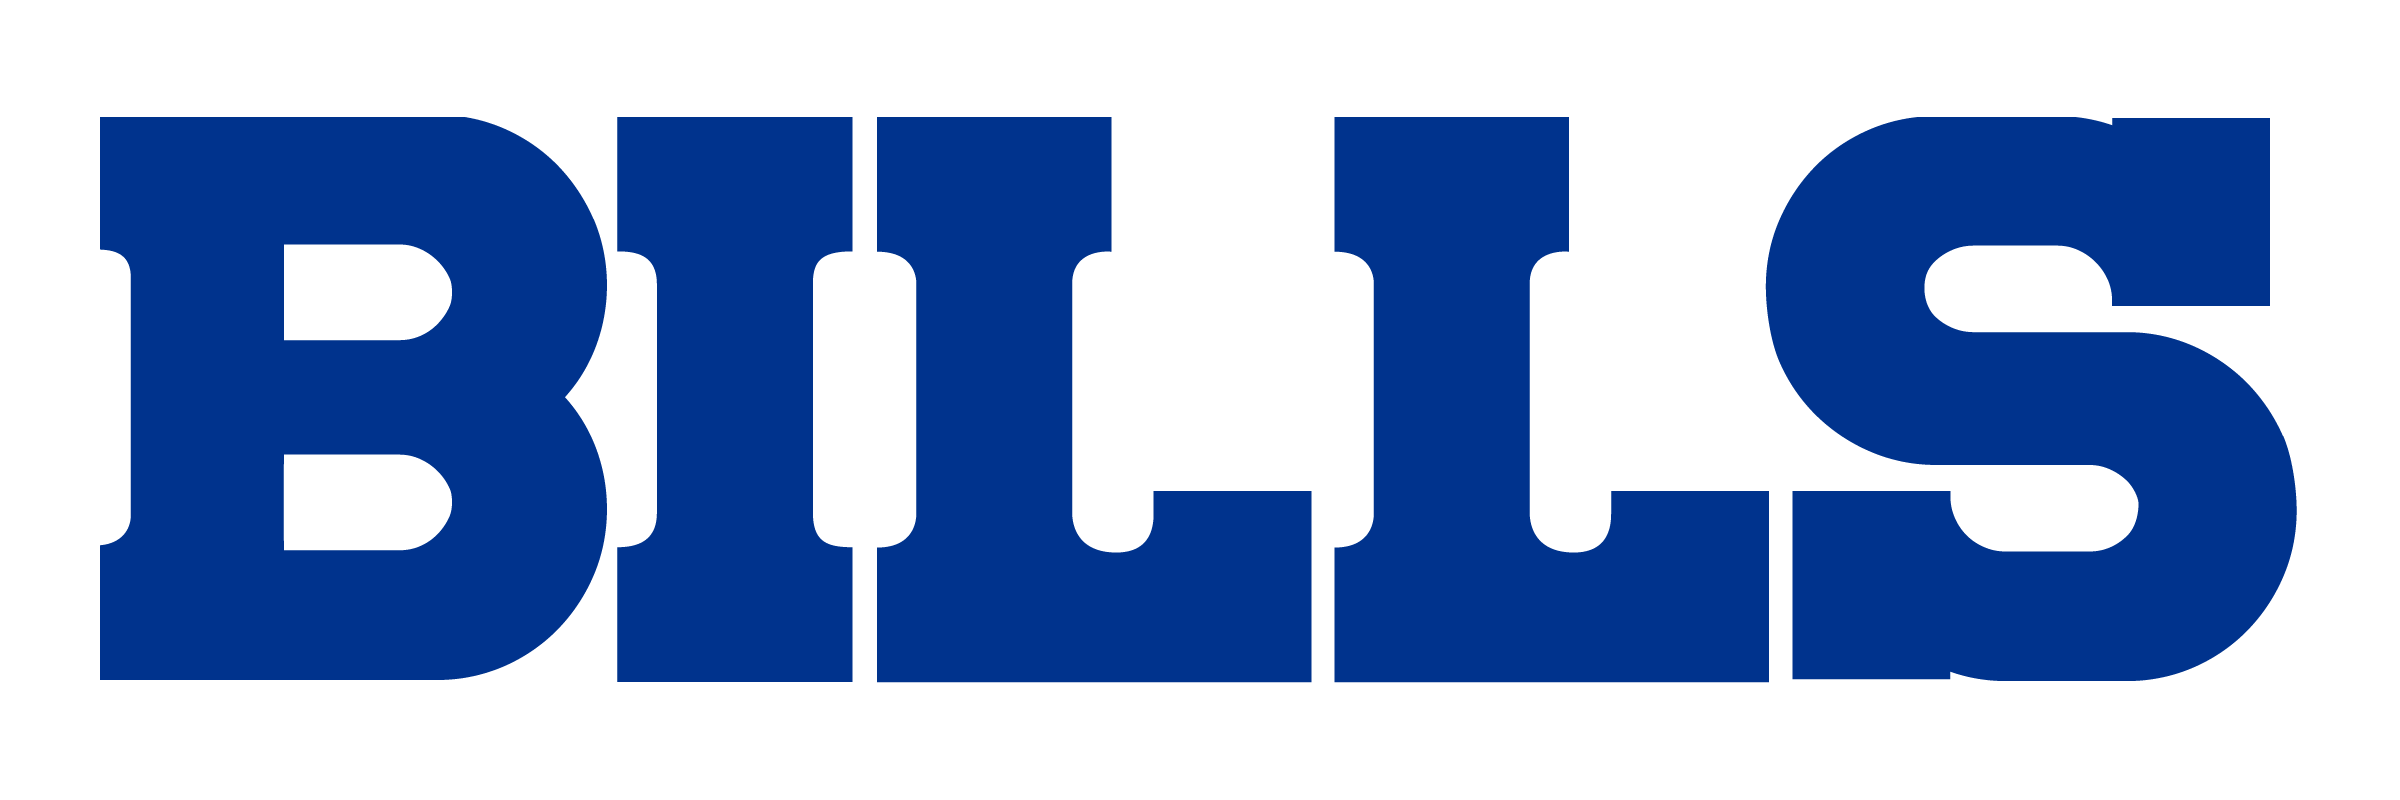 Buffalo Bills logo font - Buffalo Bills PNG